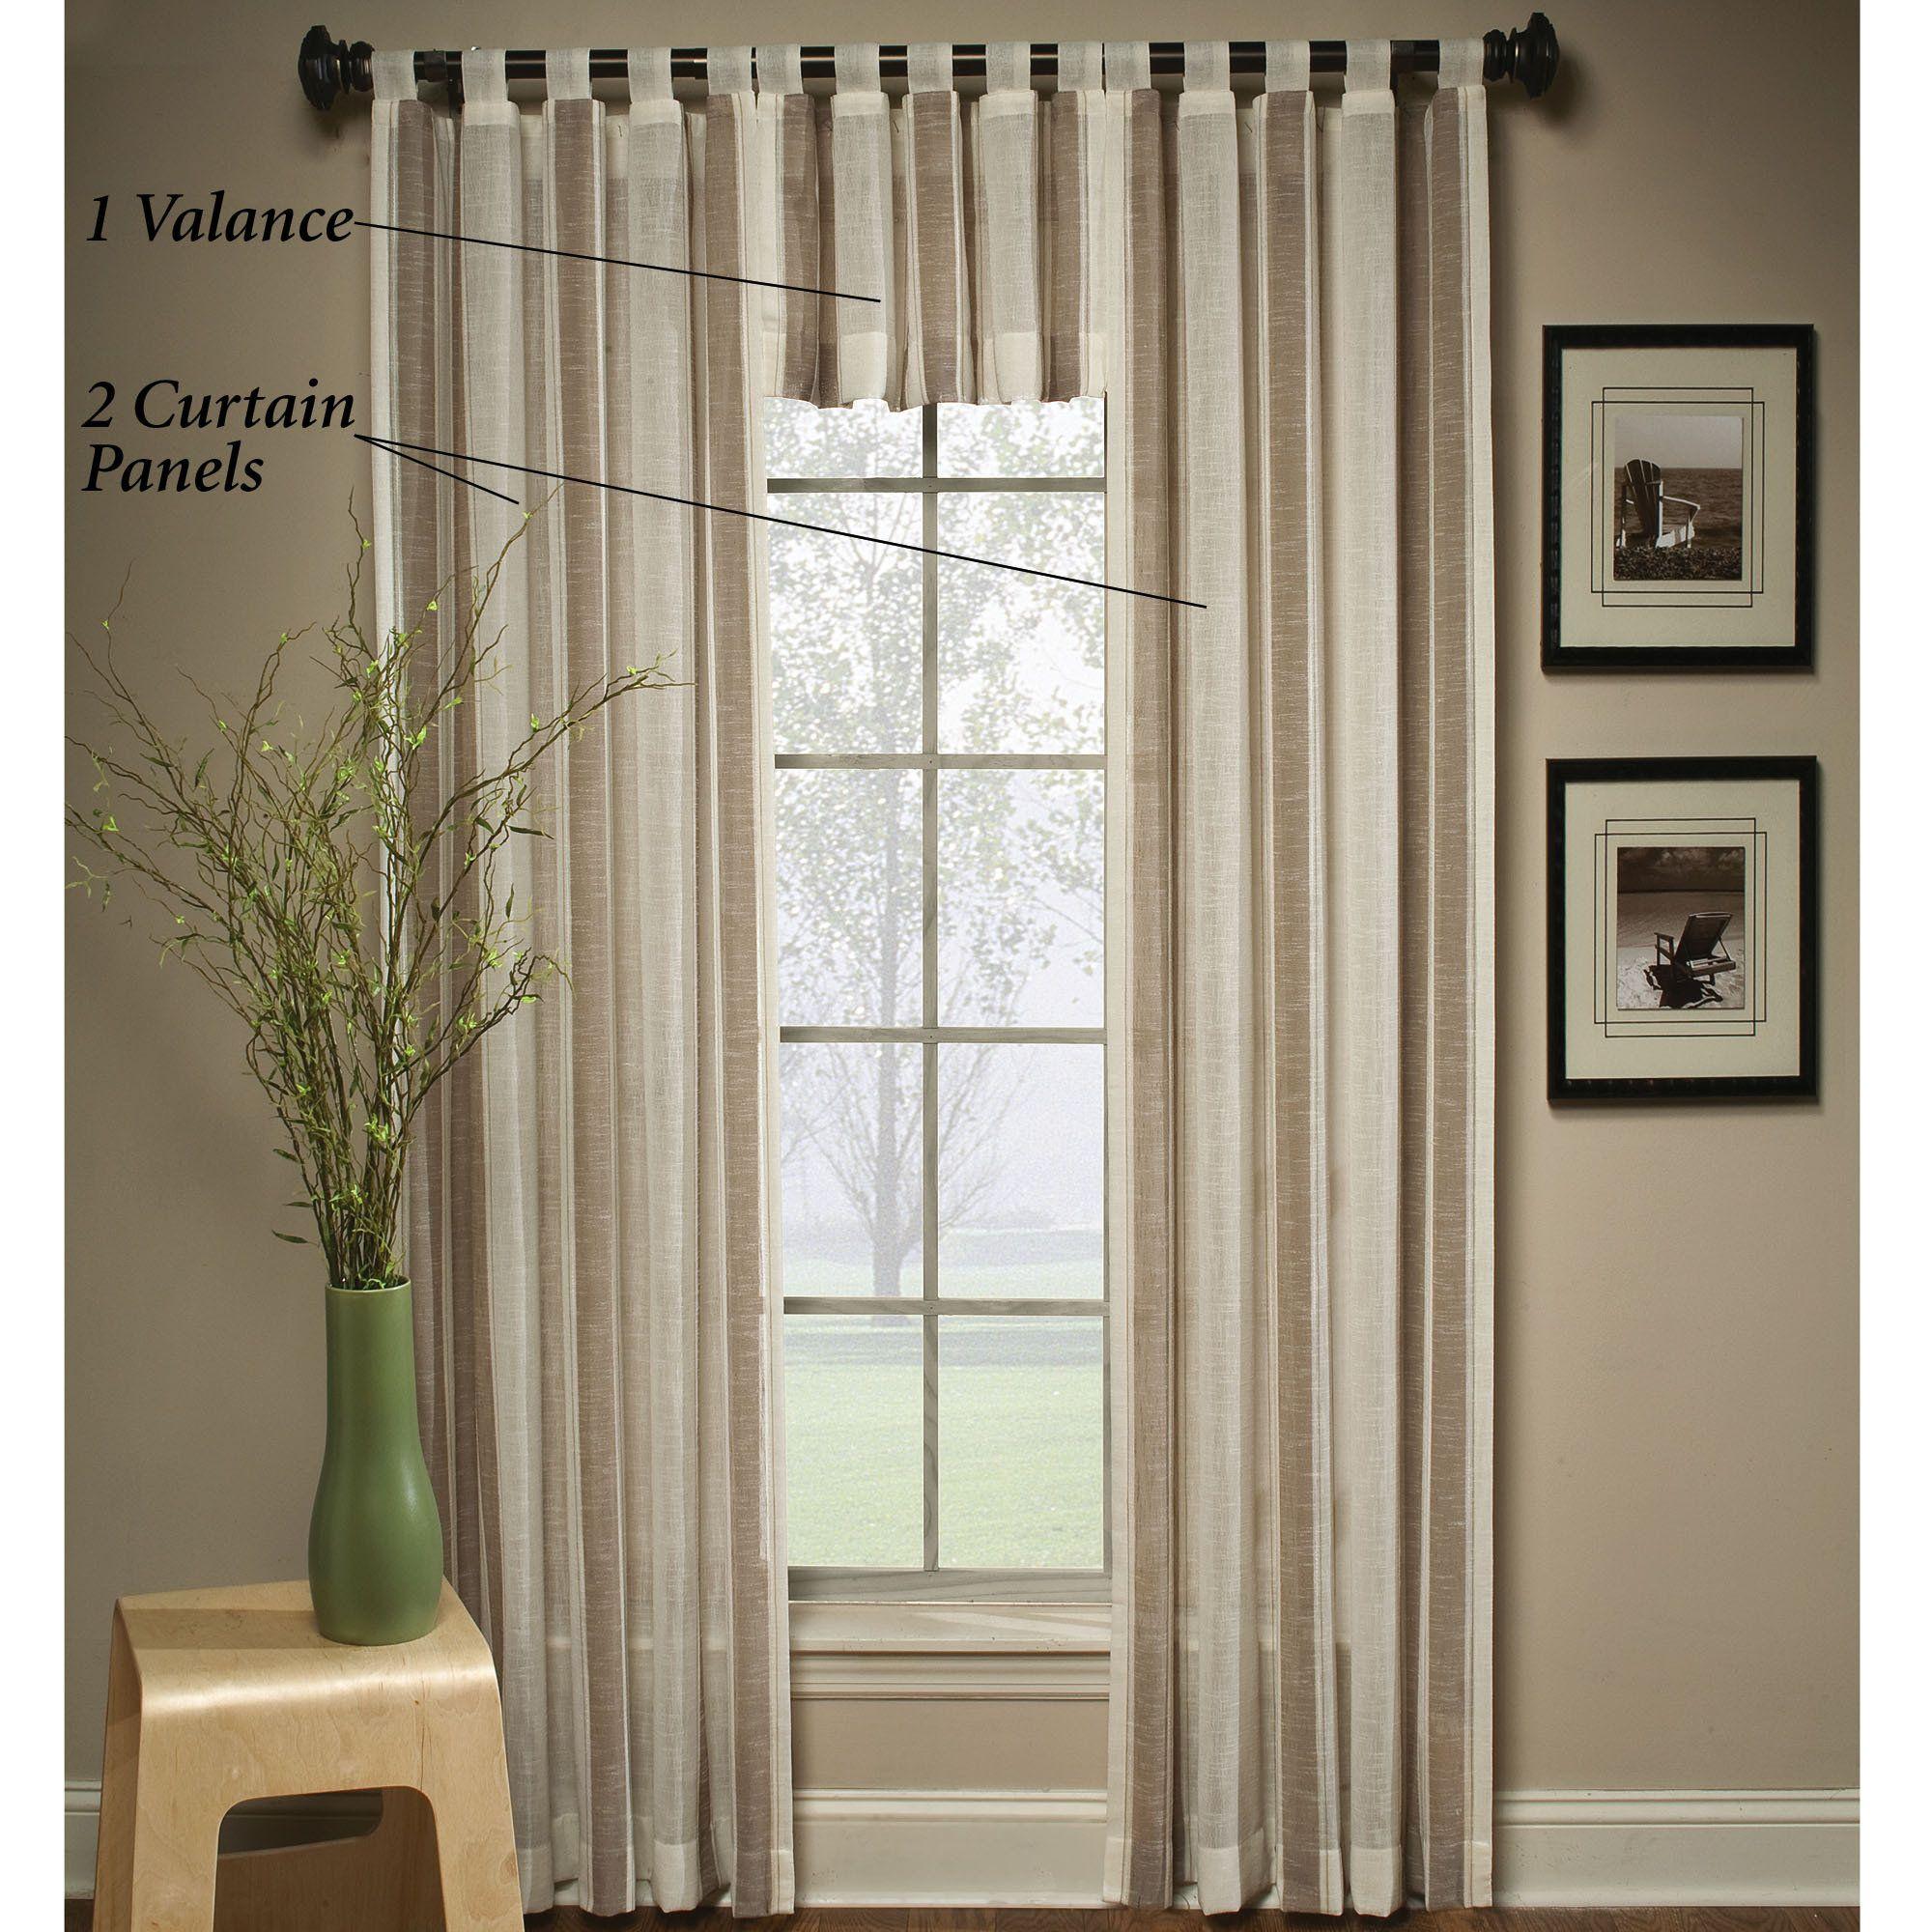 Inexpensive Kitchen Curtain Ideas: Window Treatment Ideas Uncategorized Nice Looking Brown